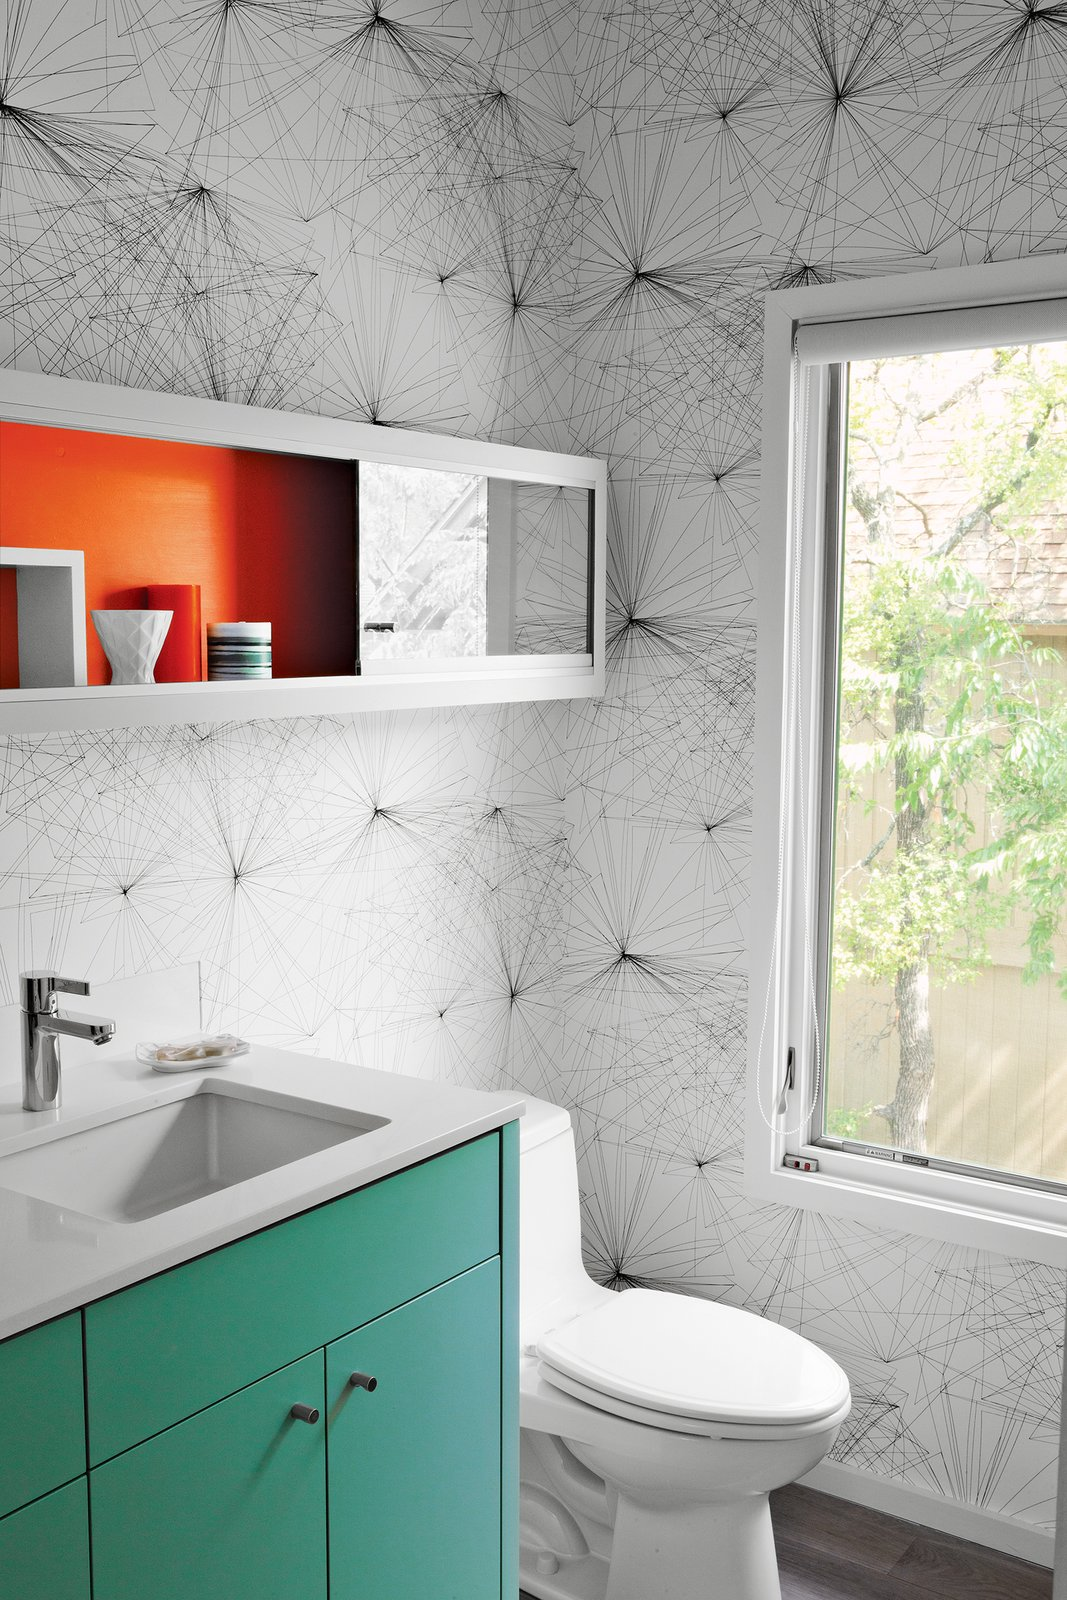 #bath&spa #bathroom #modern #interior #inside #wallpaper #graphic #renovation #JillMalek #BernsteinResidence #ArthurDallasStenger #Rick&CindyBlackArchitects  Photo 31 of 42 in Wallpaper That Fixes Walls